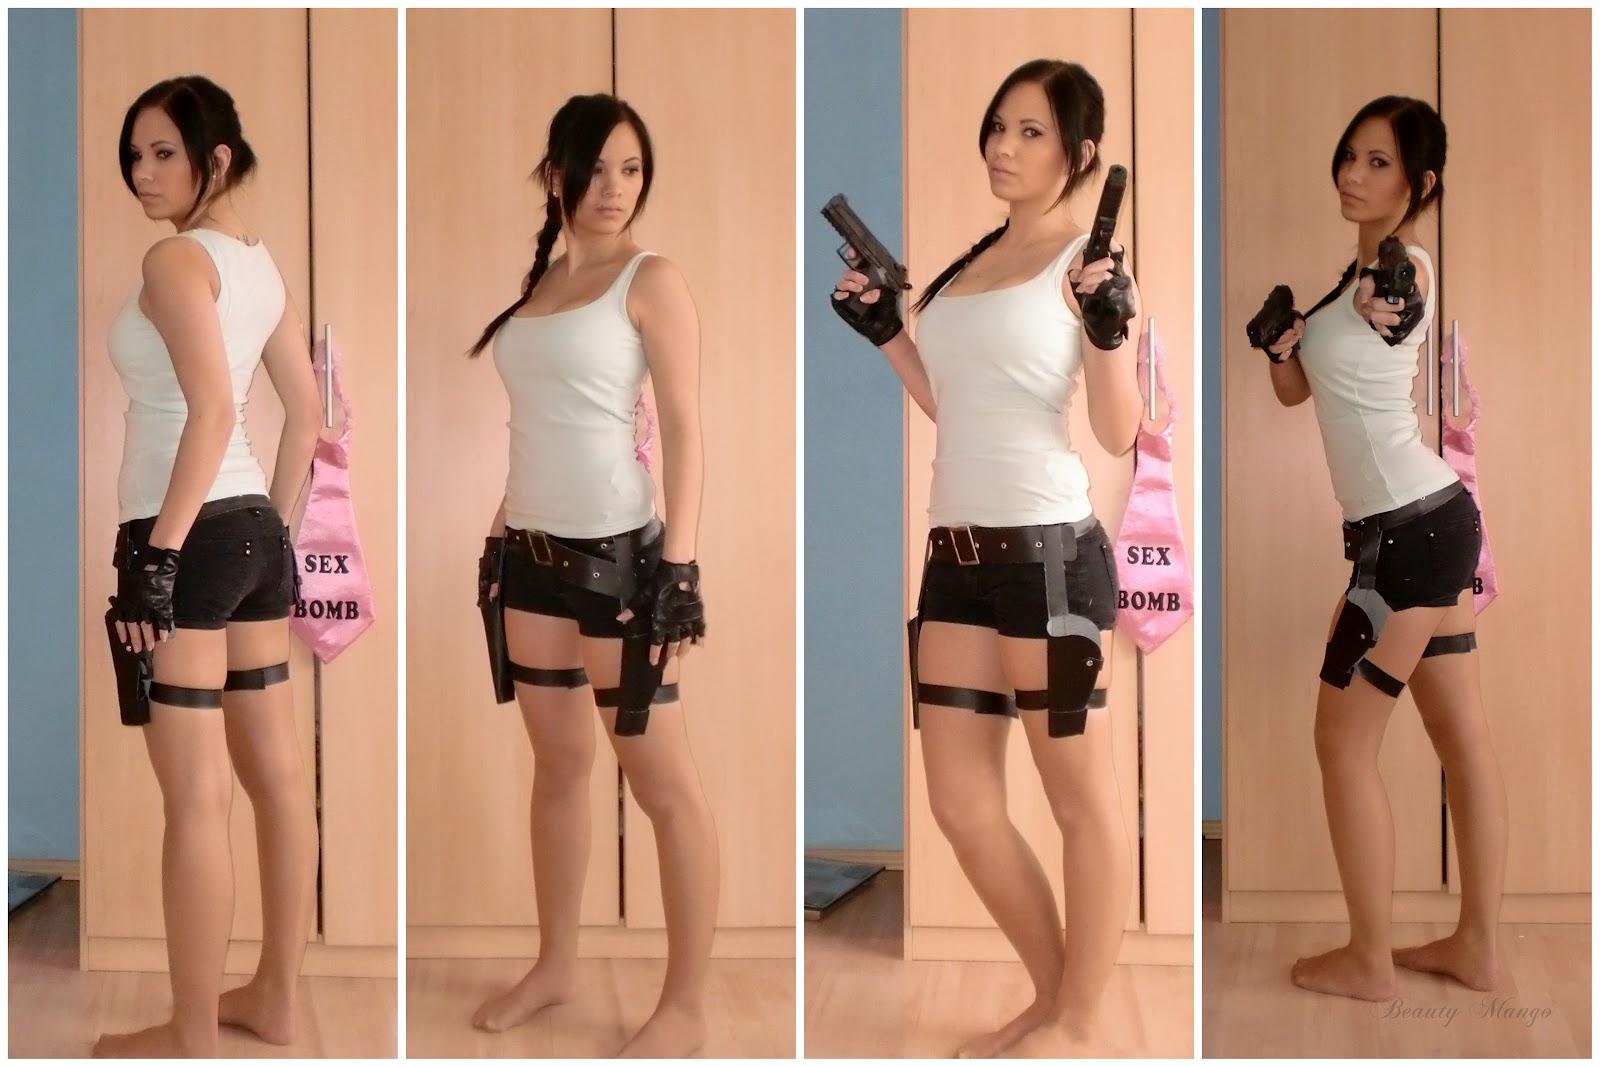 Fasching Lara Croft In Tomb Raider Beauty Mango